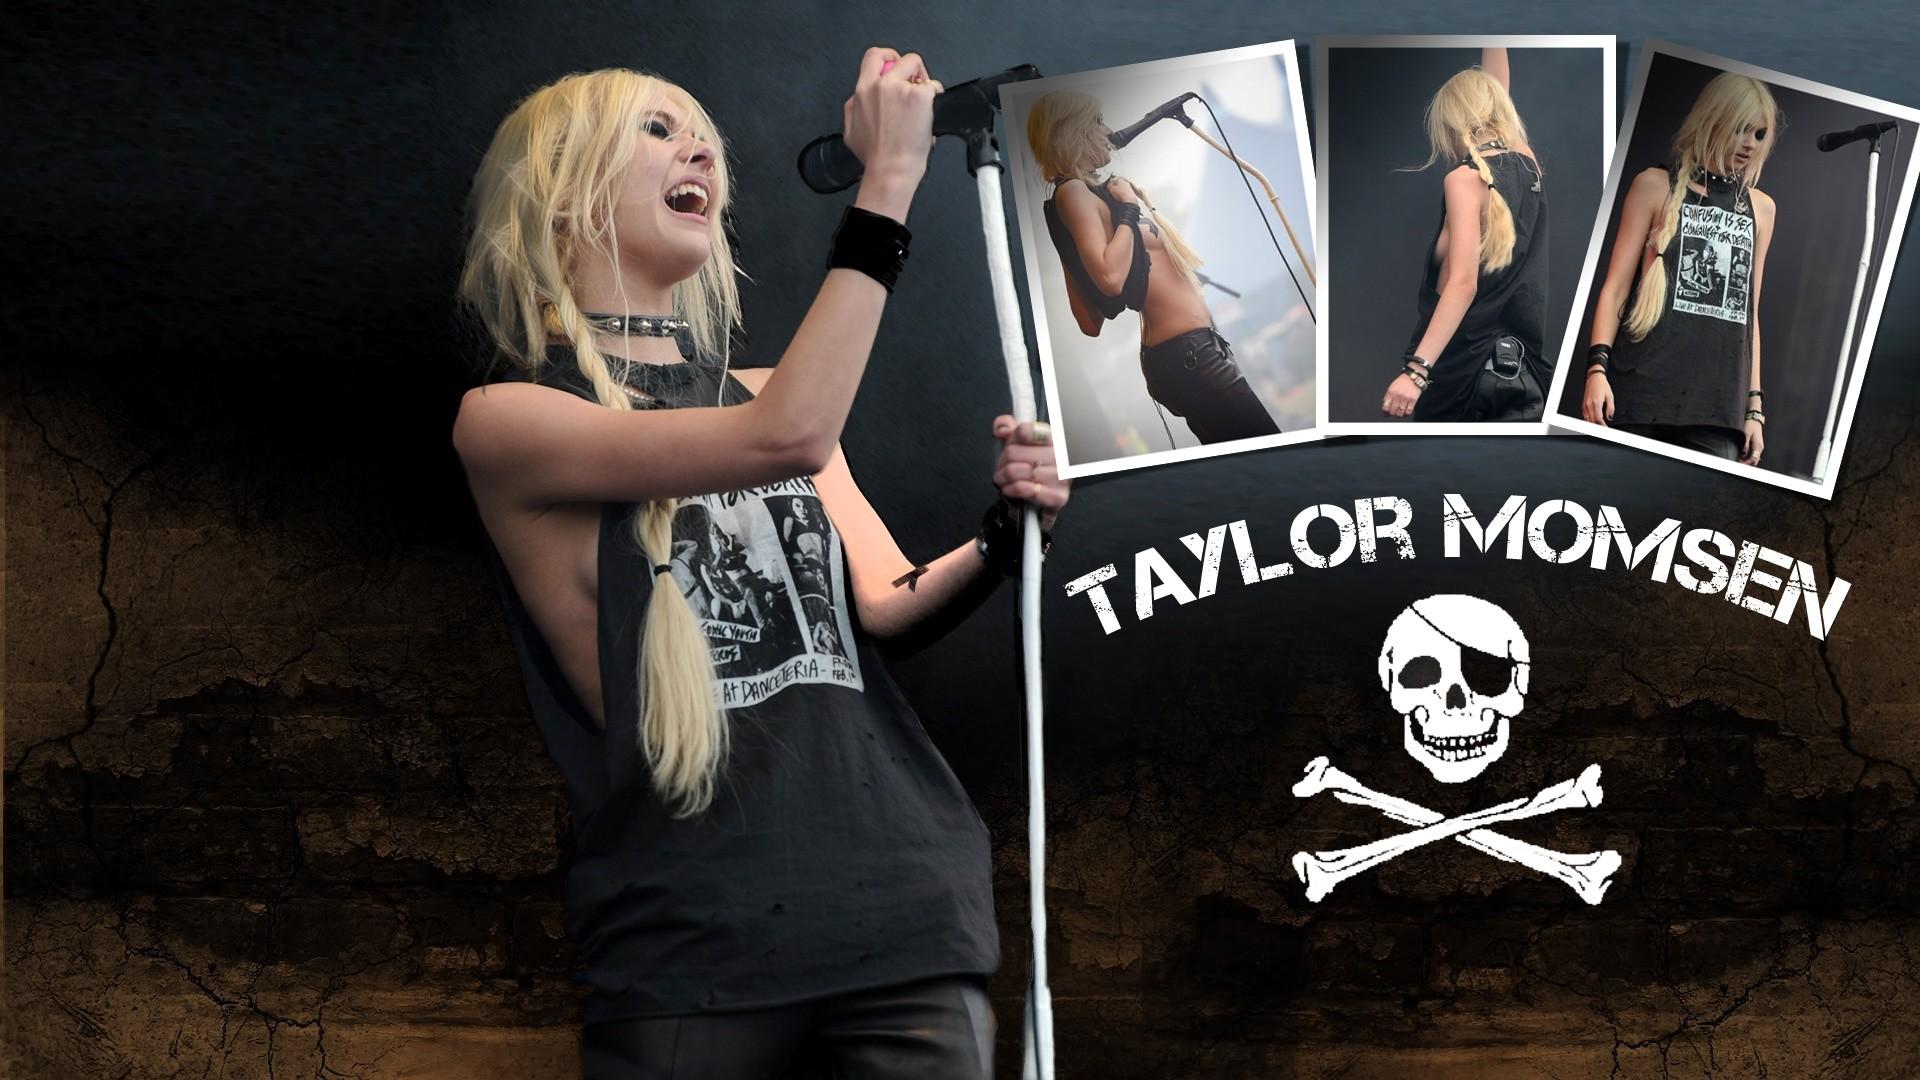 … Taylor-Momsen-Photos10 by FunkyCop999